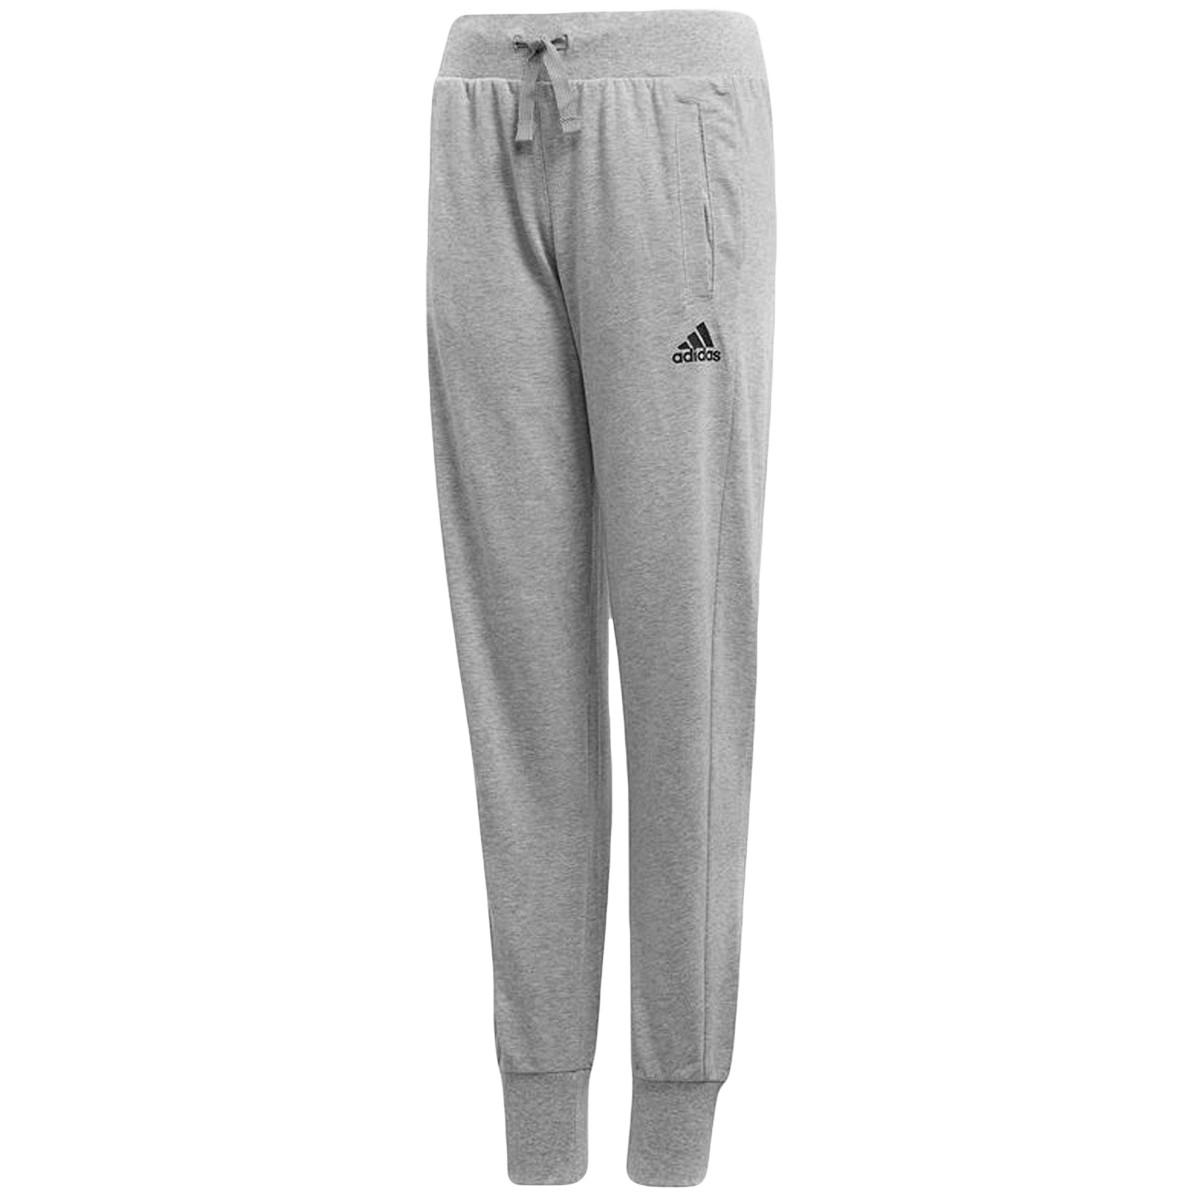 Junior Fille Tennispro Pantalon Adidas Essentials OUO7f